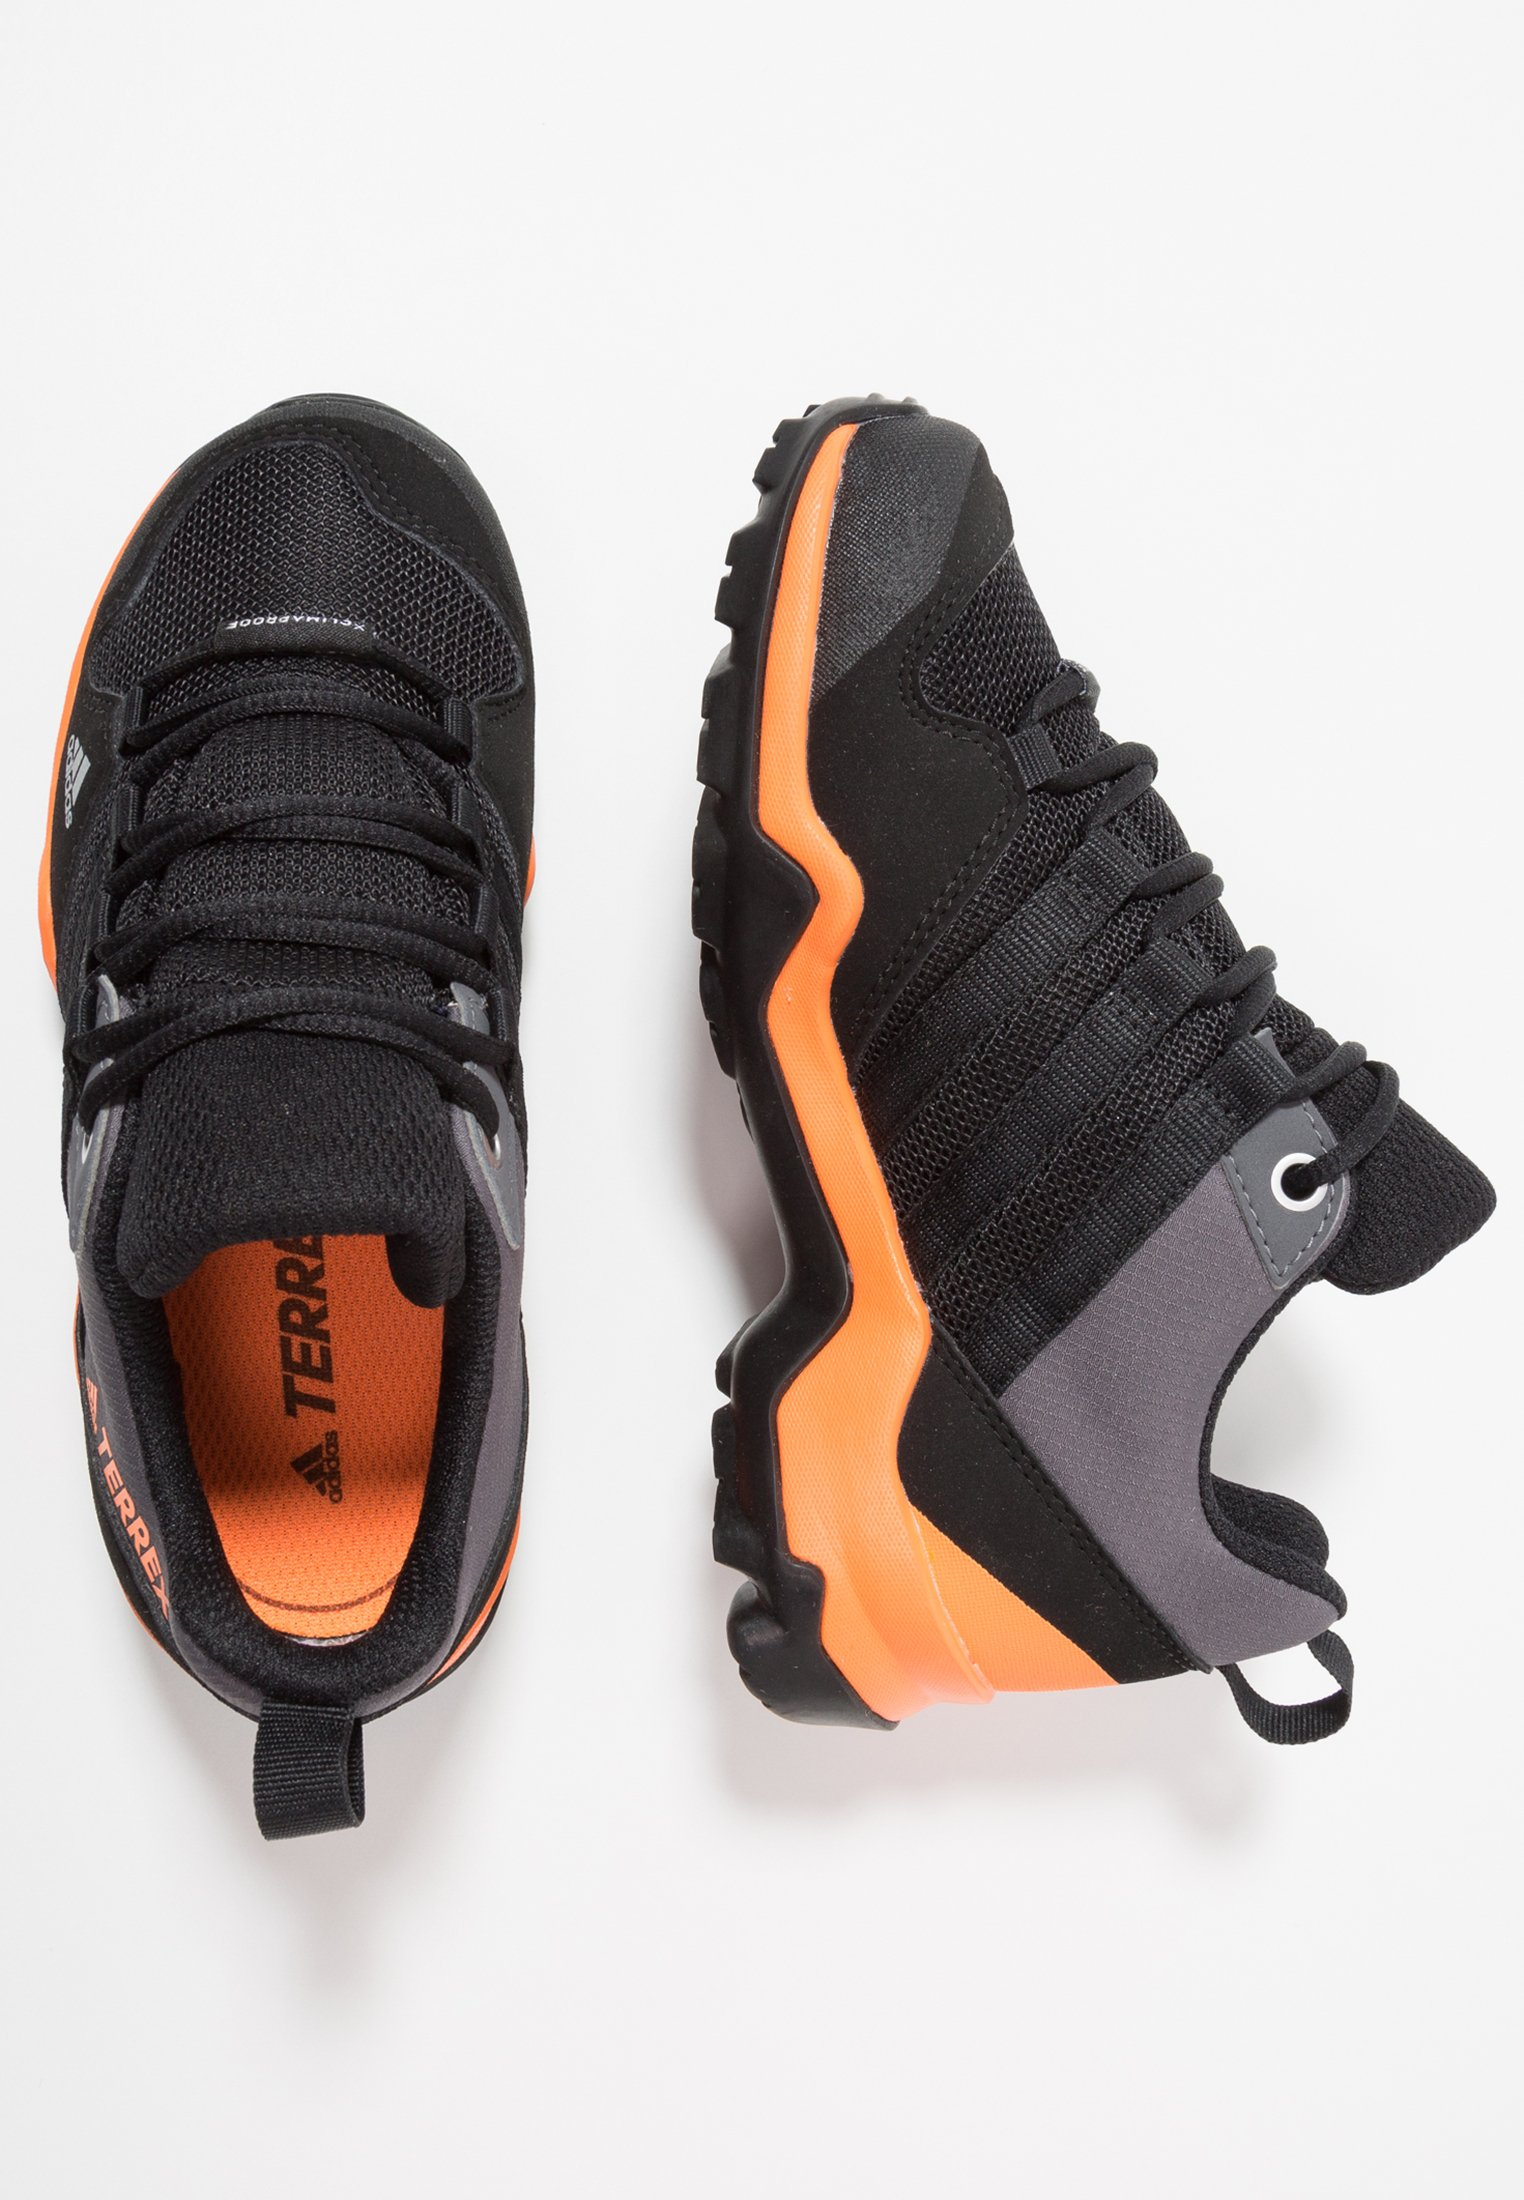 TERREX AX2R RAIN.RDY Hikingskor core blackhi res orange